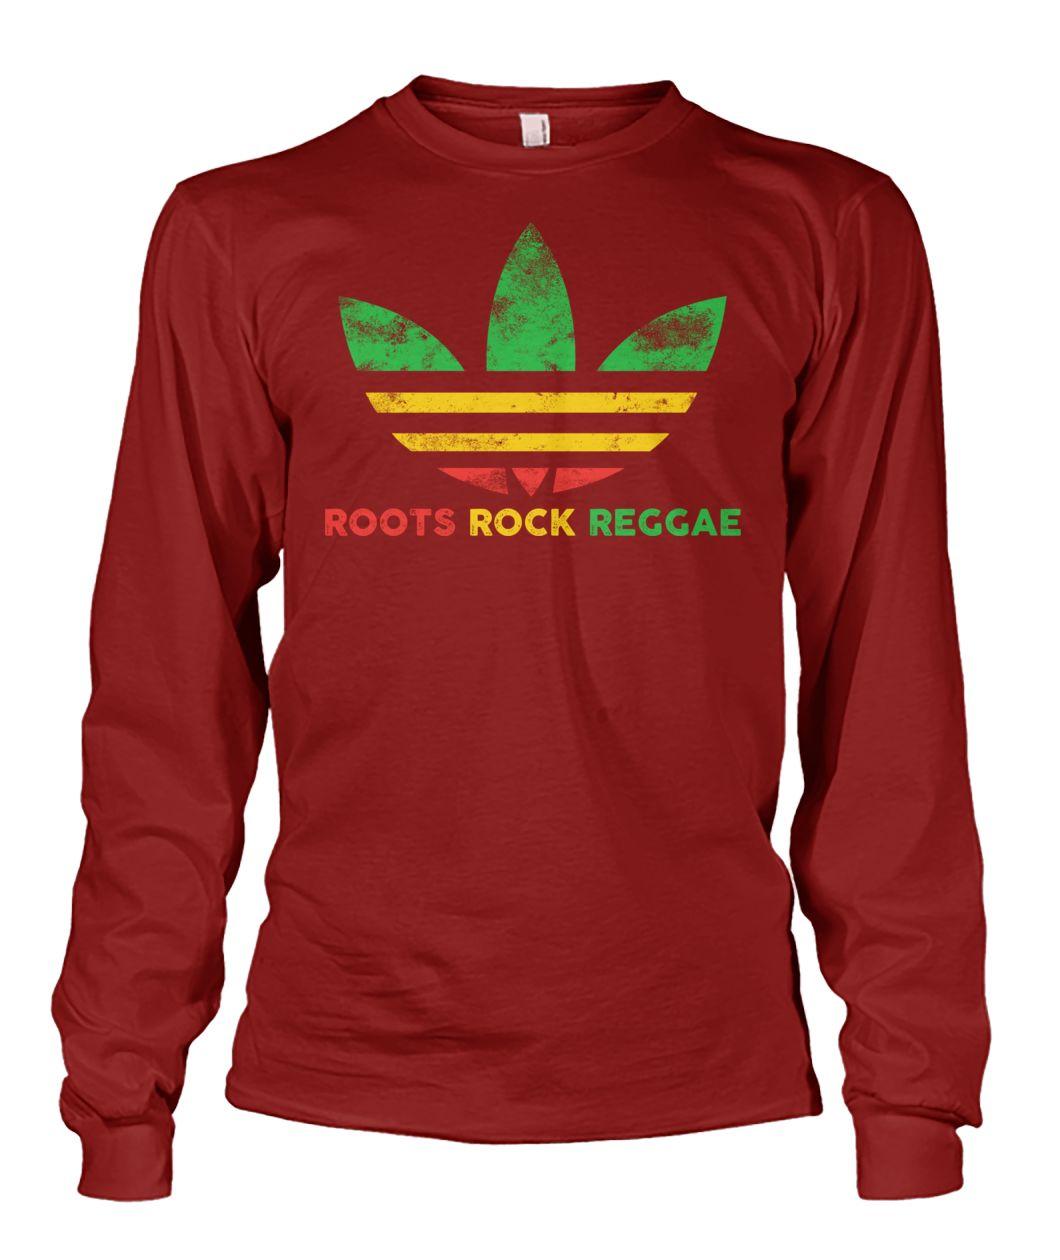 Roots Rock Reggae Adidas vintage long sleeve